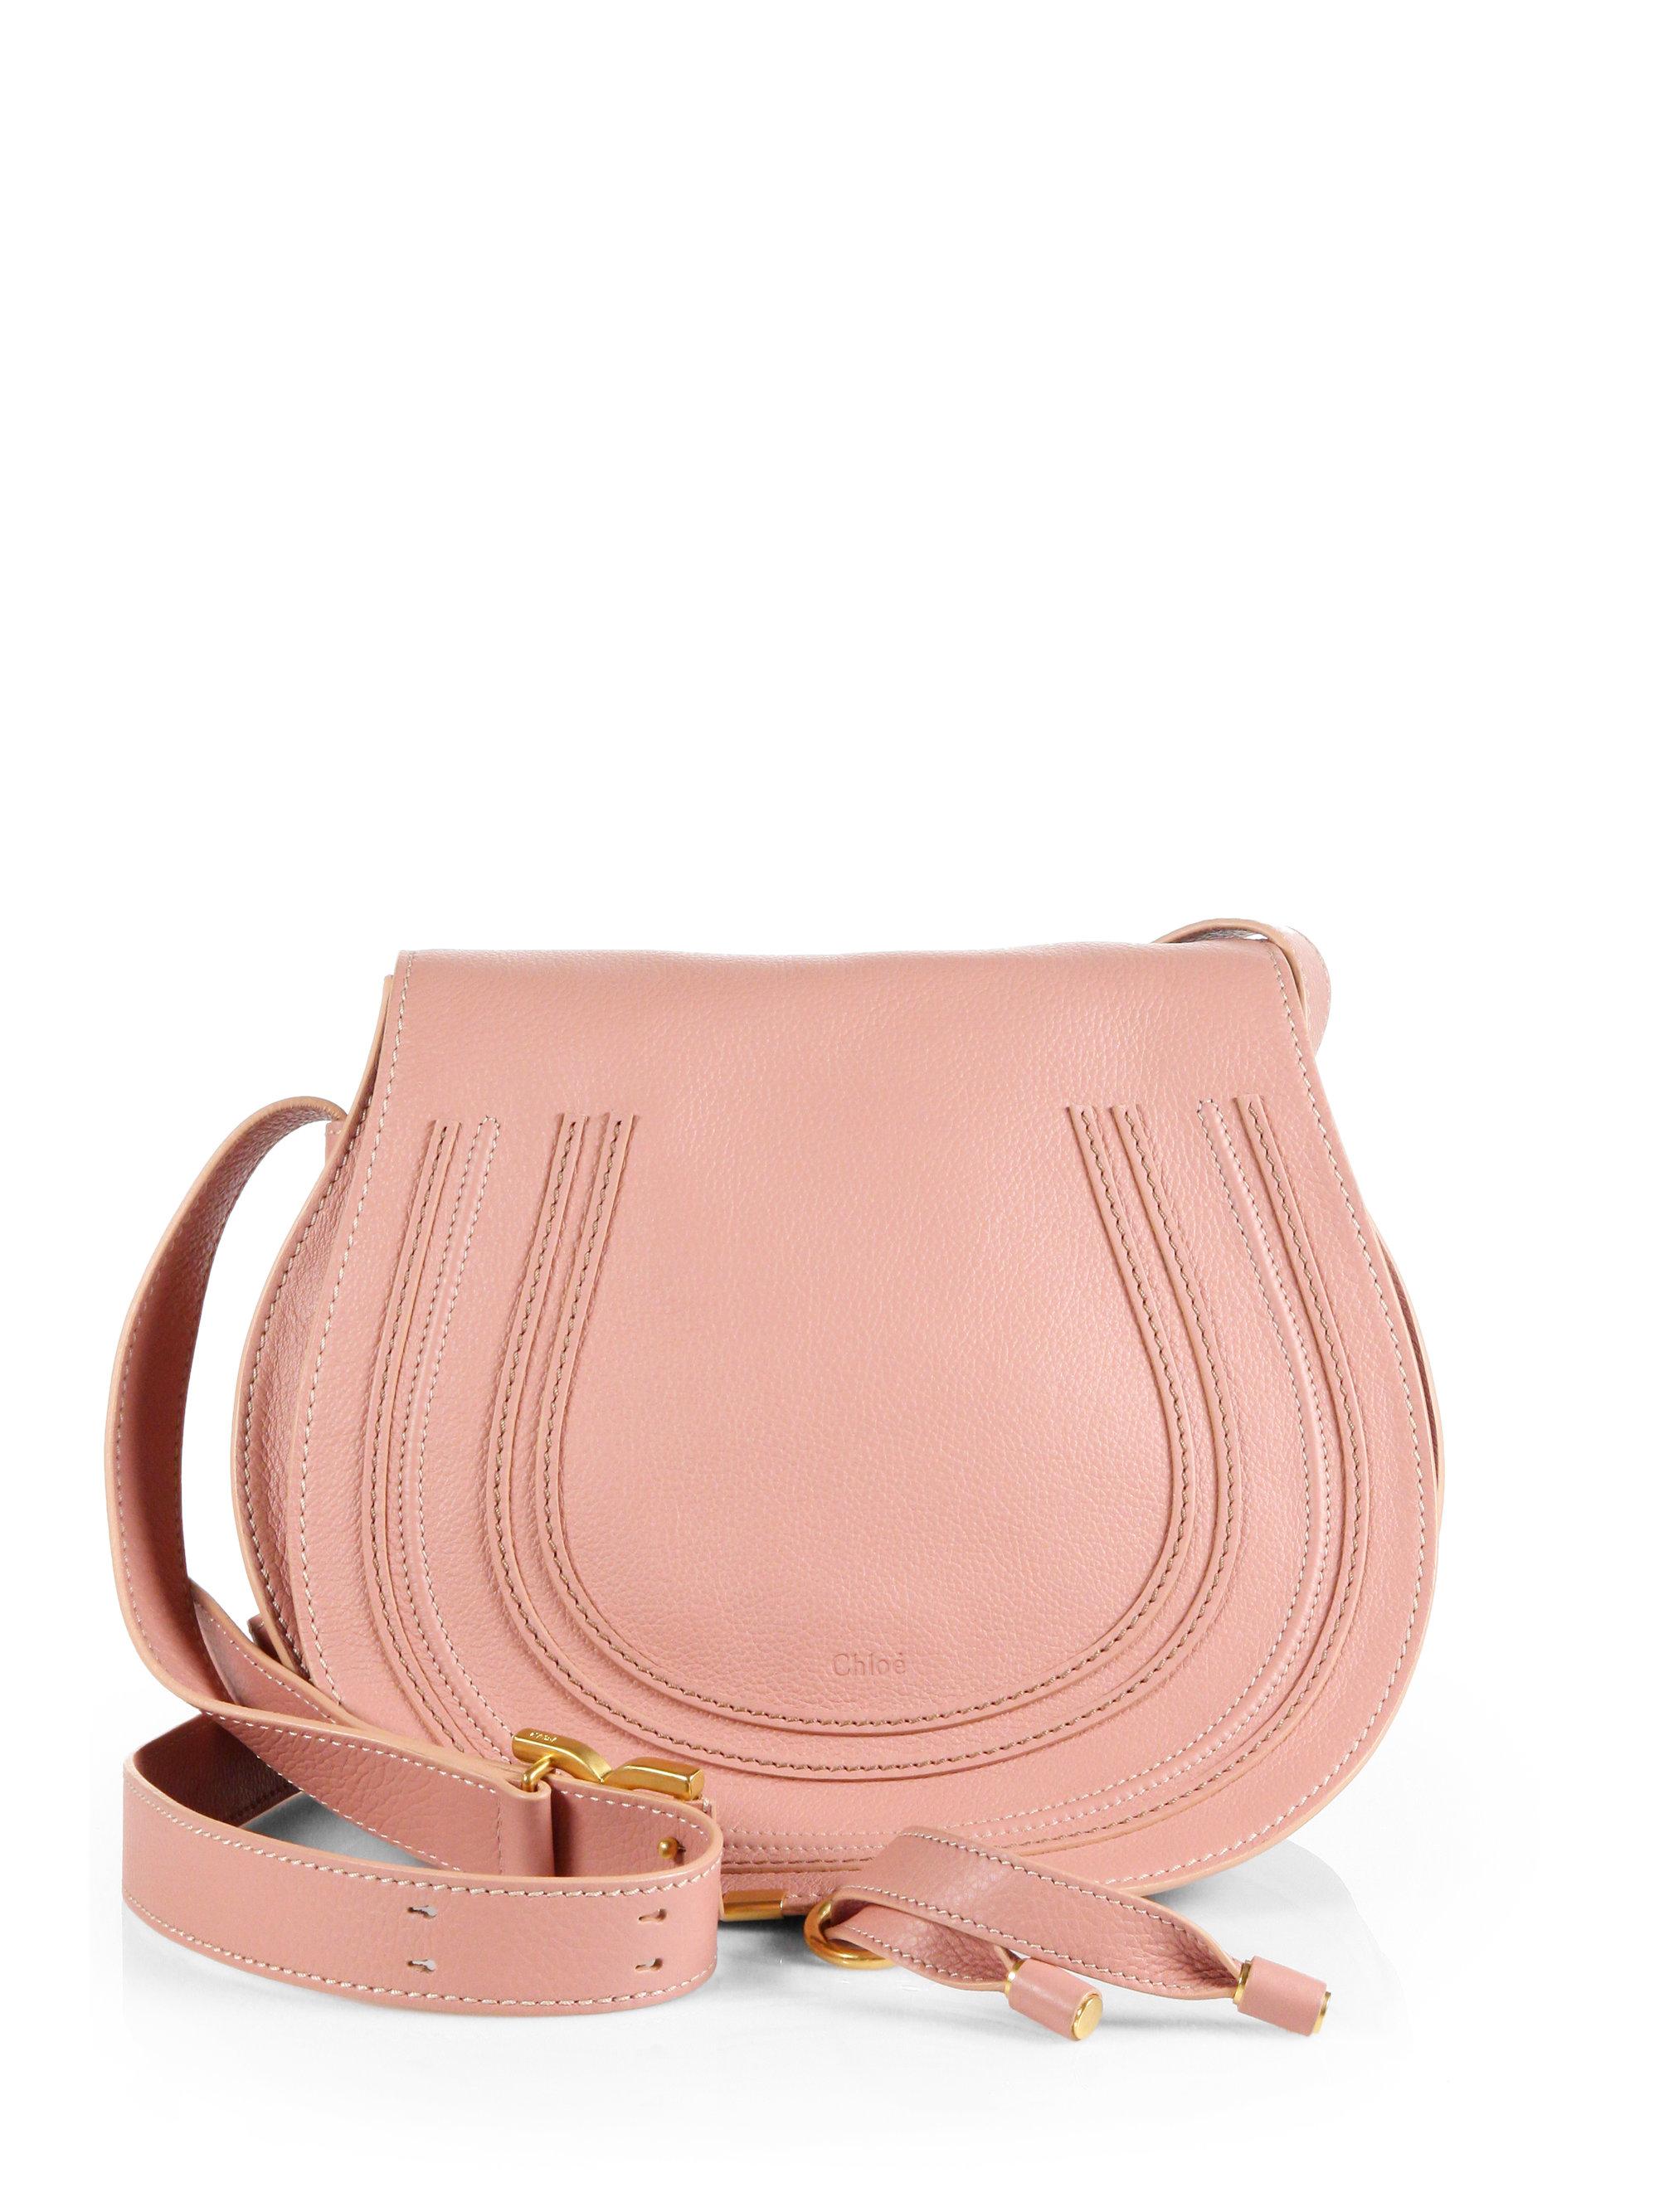 Lyst - Chloé Marcie Medium Leather Saddle Bag in Pink 47ad773297a61